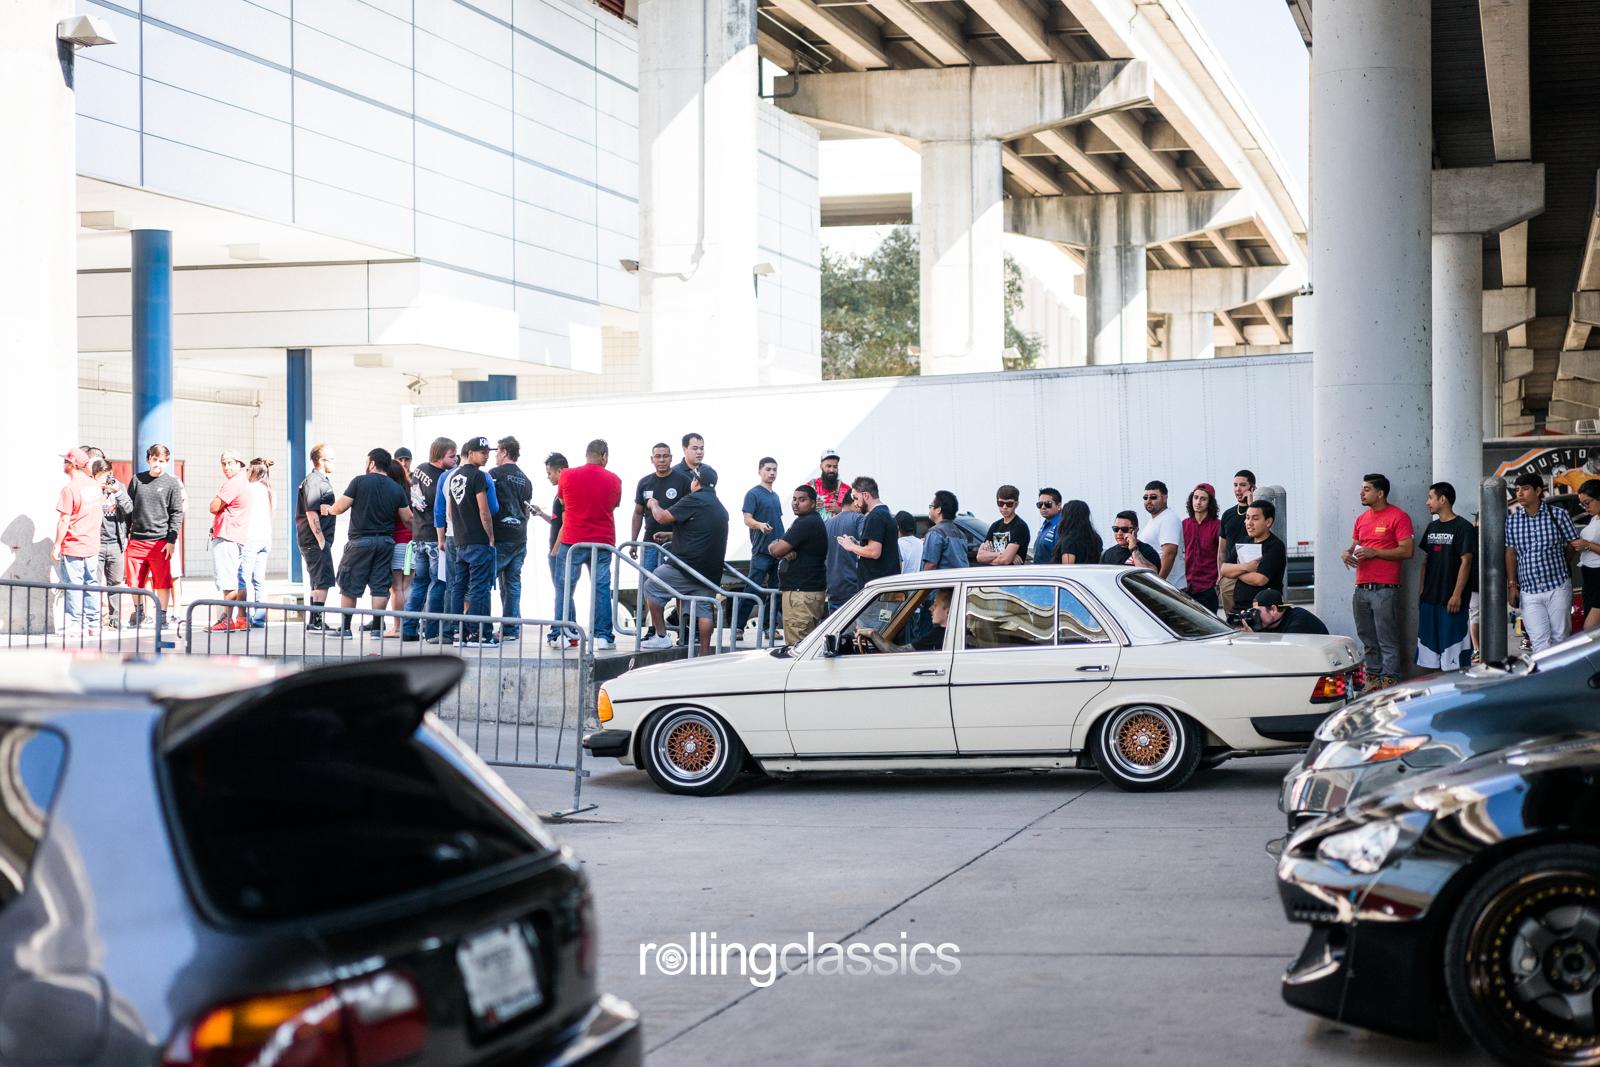 Rolling Classics Event Wekfest Texas Part Of - Mercedes tx car show